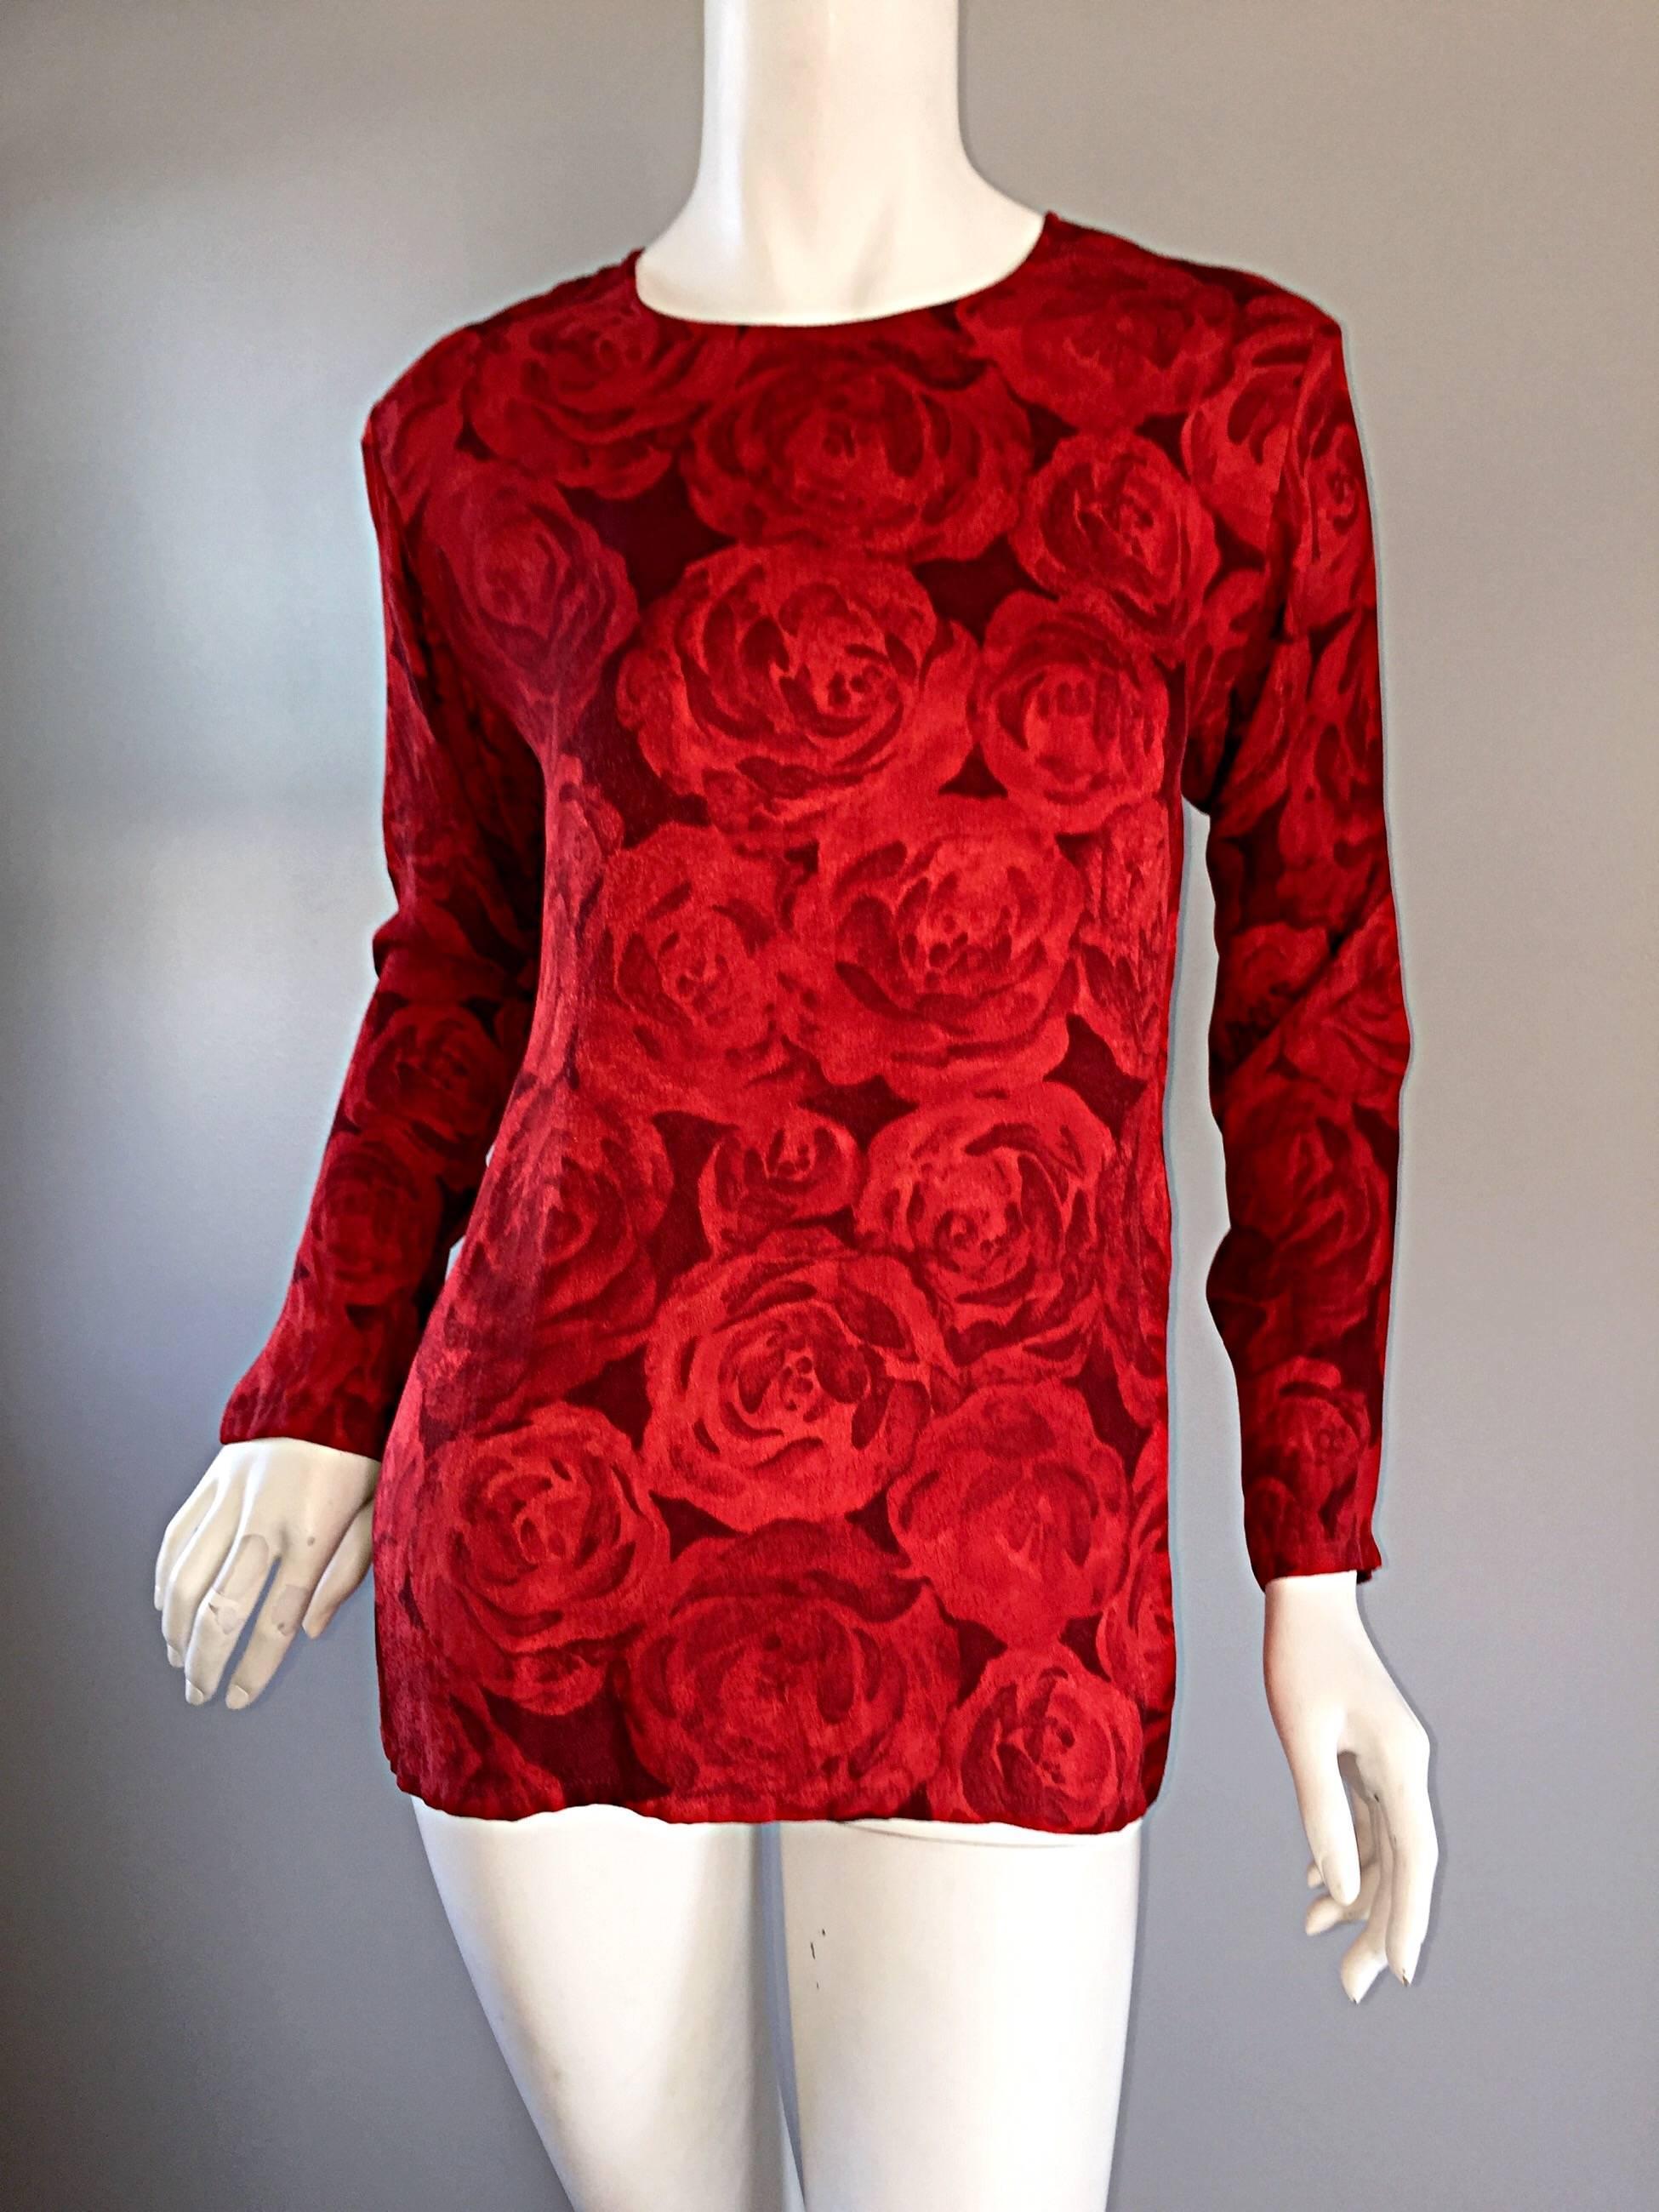 b6ae137446ad6b Beautiful Vintage Yves Saint Laurent   Rive Gauche   Rose Print Silk Blouse  Top For Sale at 1stdibs